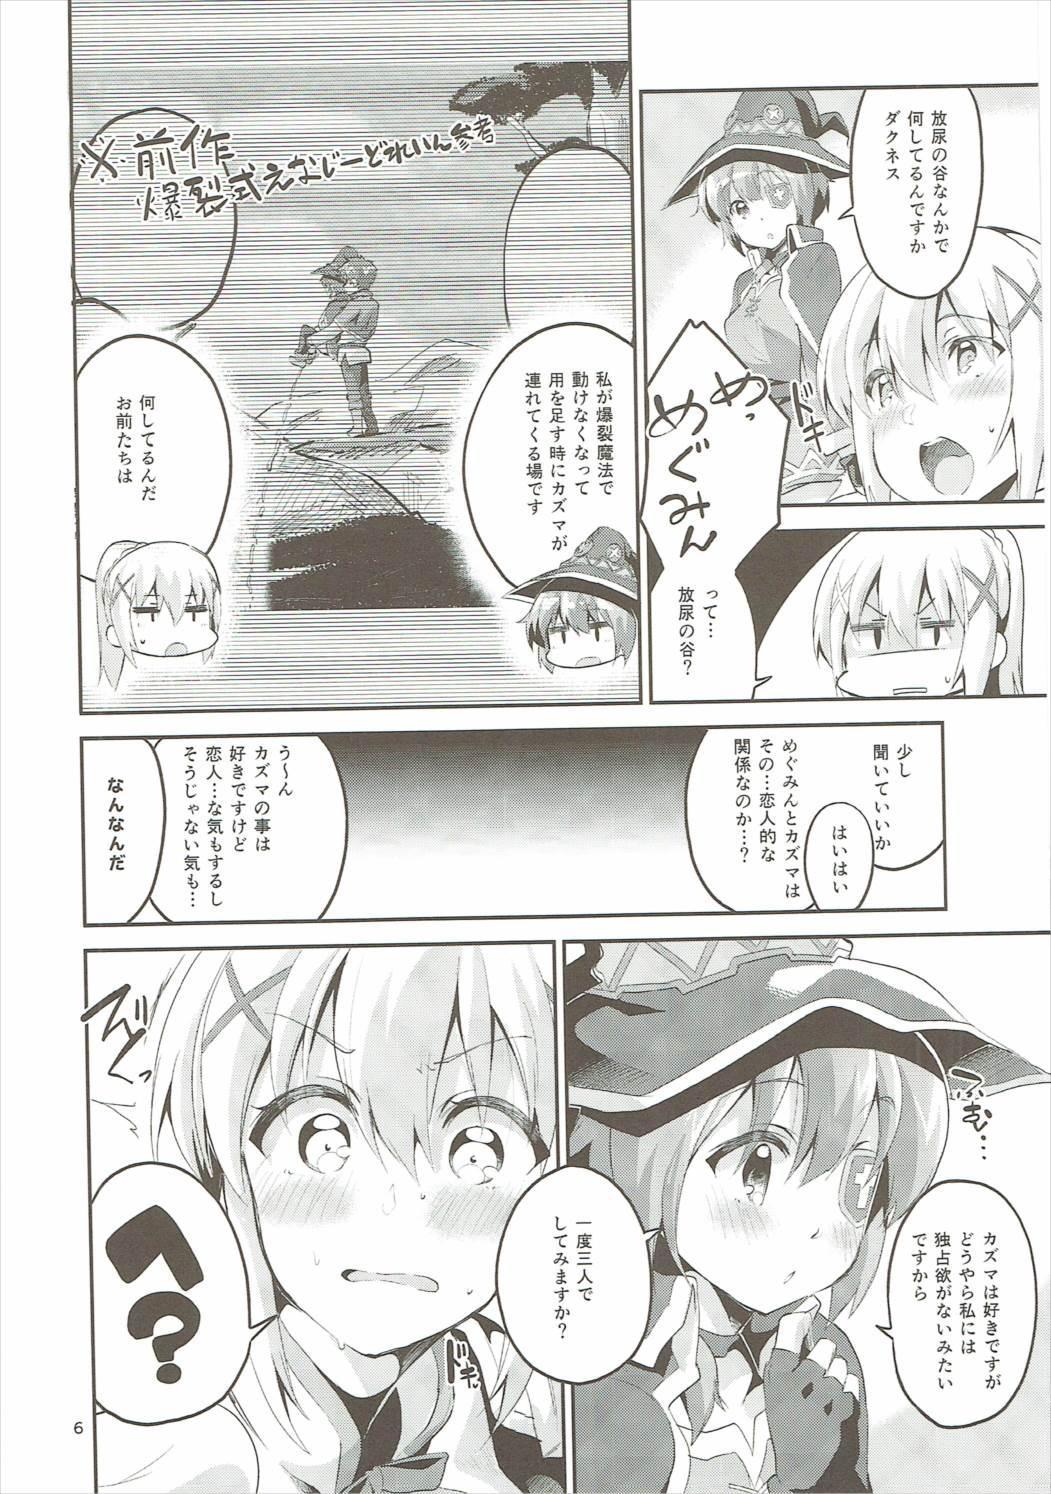 Kukkoro Musume no Koi Gokoro 4